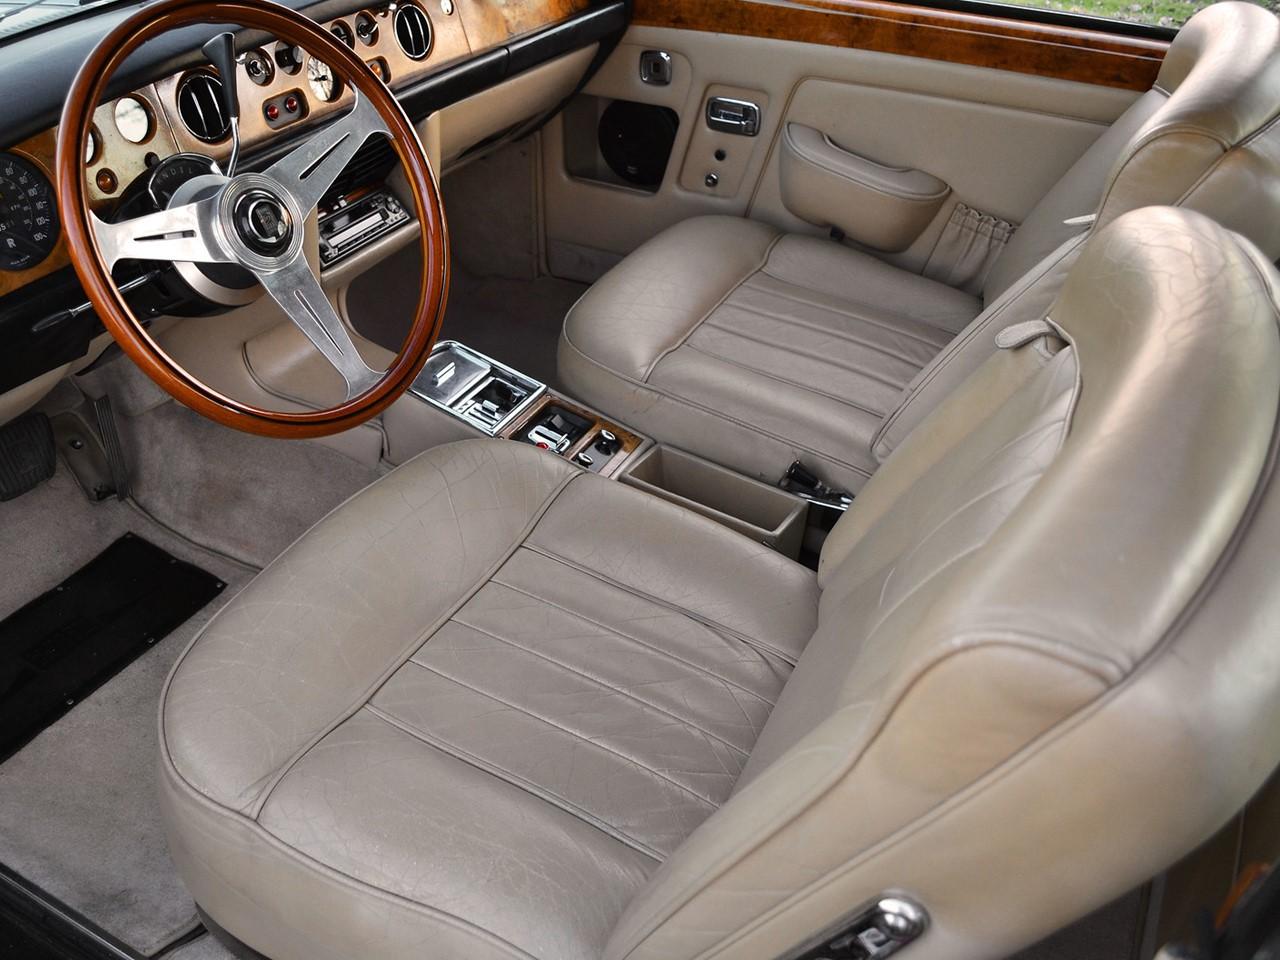 1969 MPW Fixedhead coupe 5